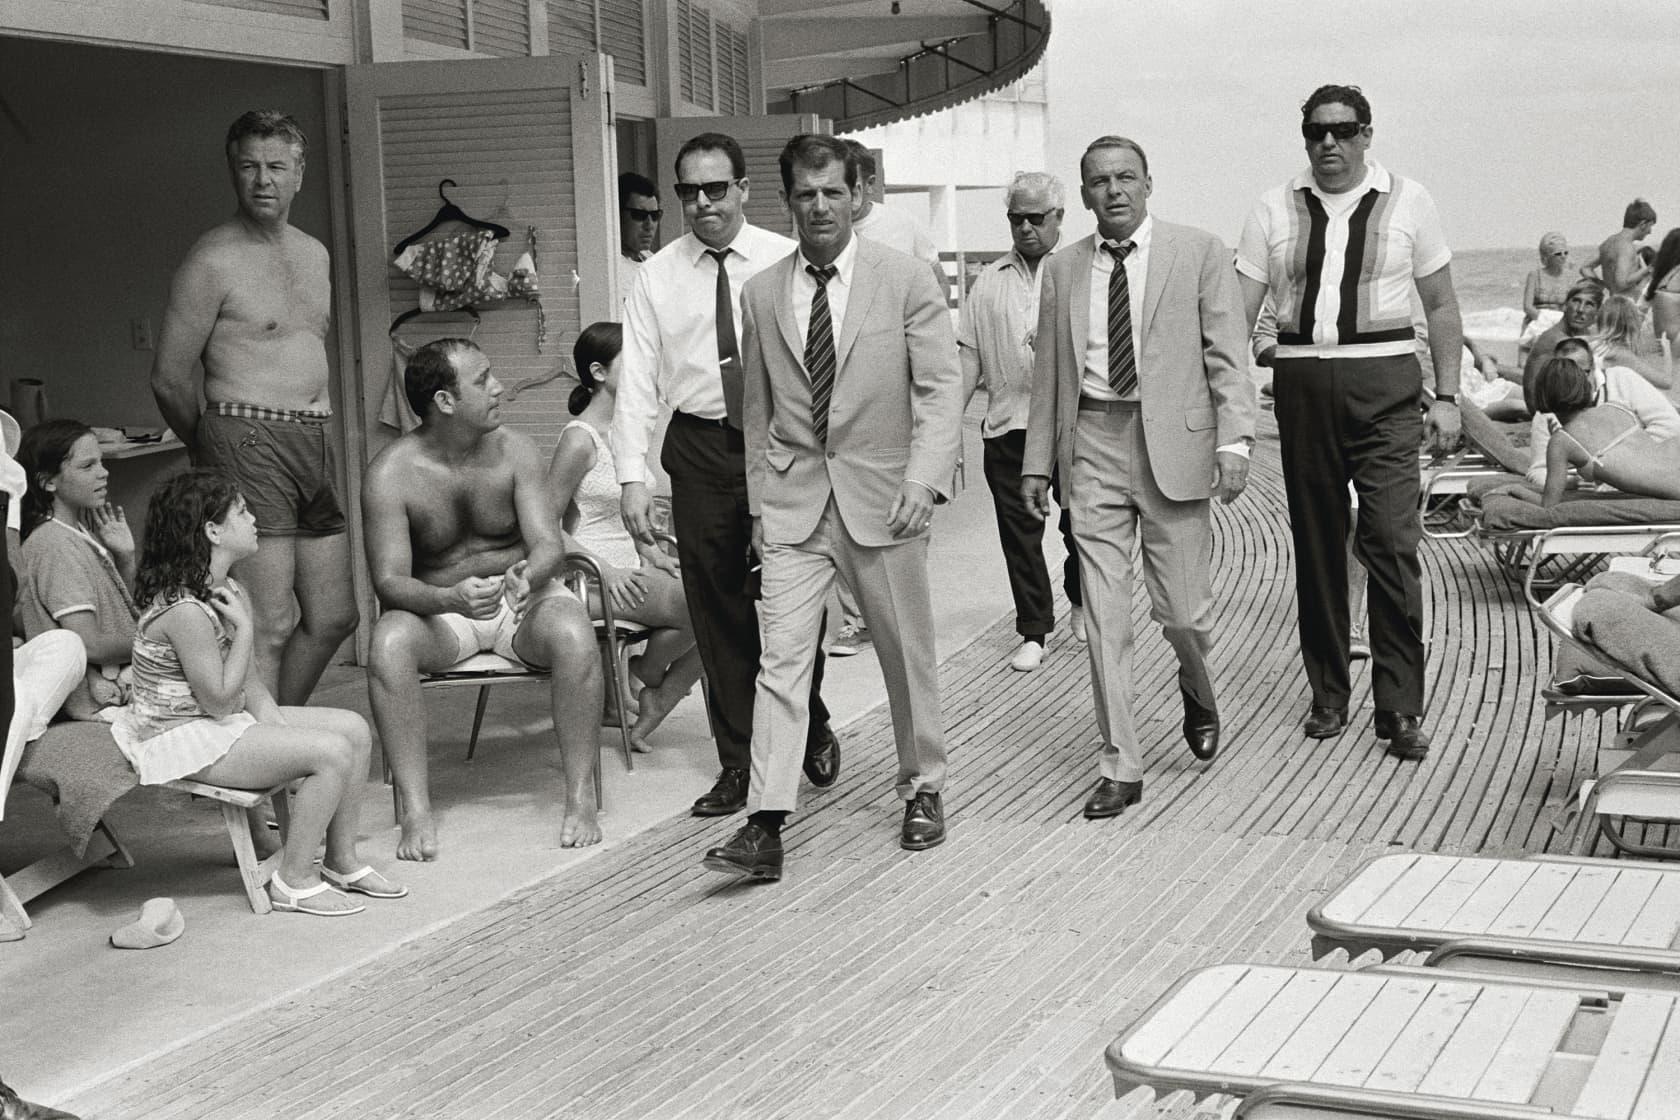 Terry O'Neill, Frank Sinatra, Miami Boardwalk - Black & White, 1968